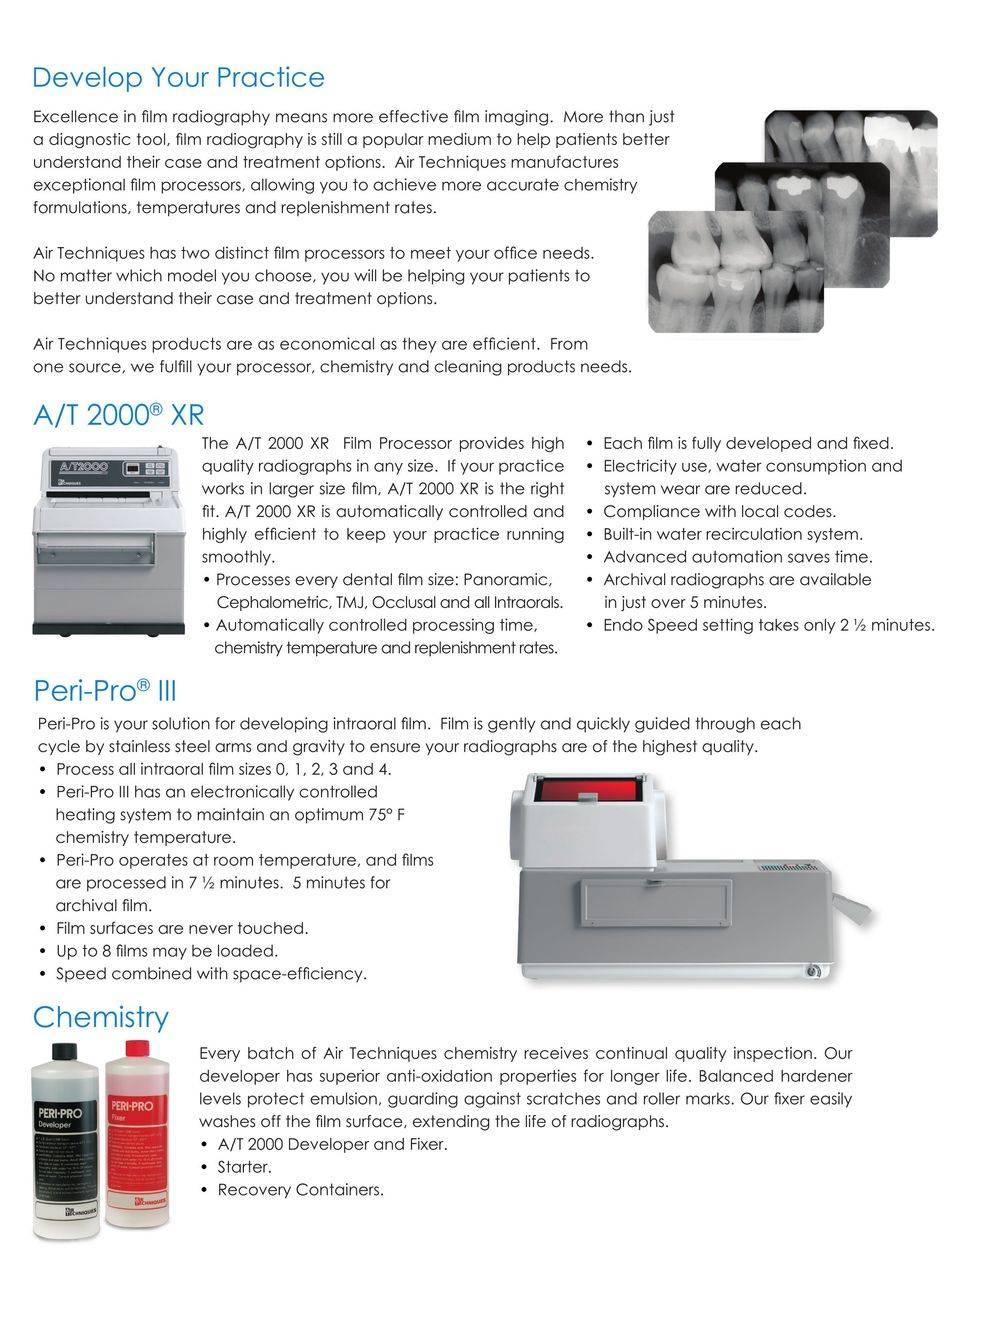 Air Techniques Film Processor Brochure Page 2